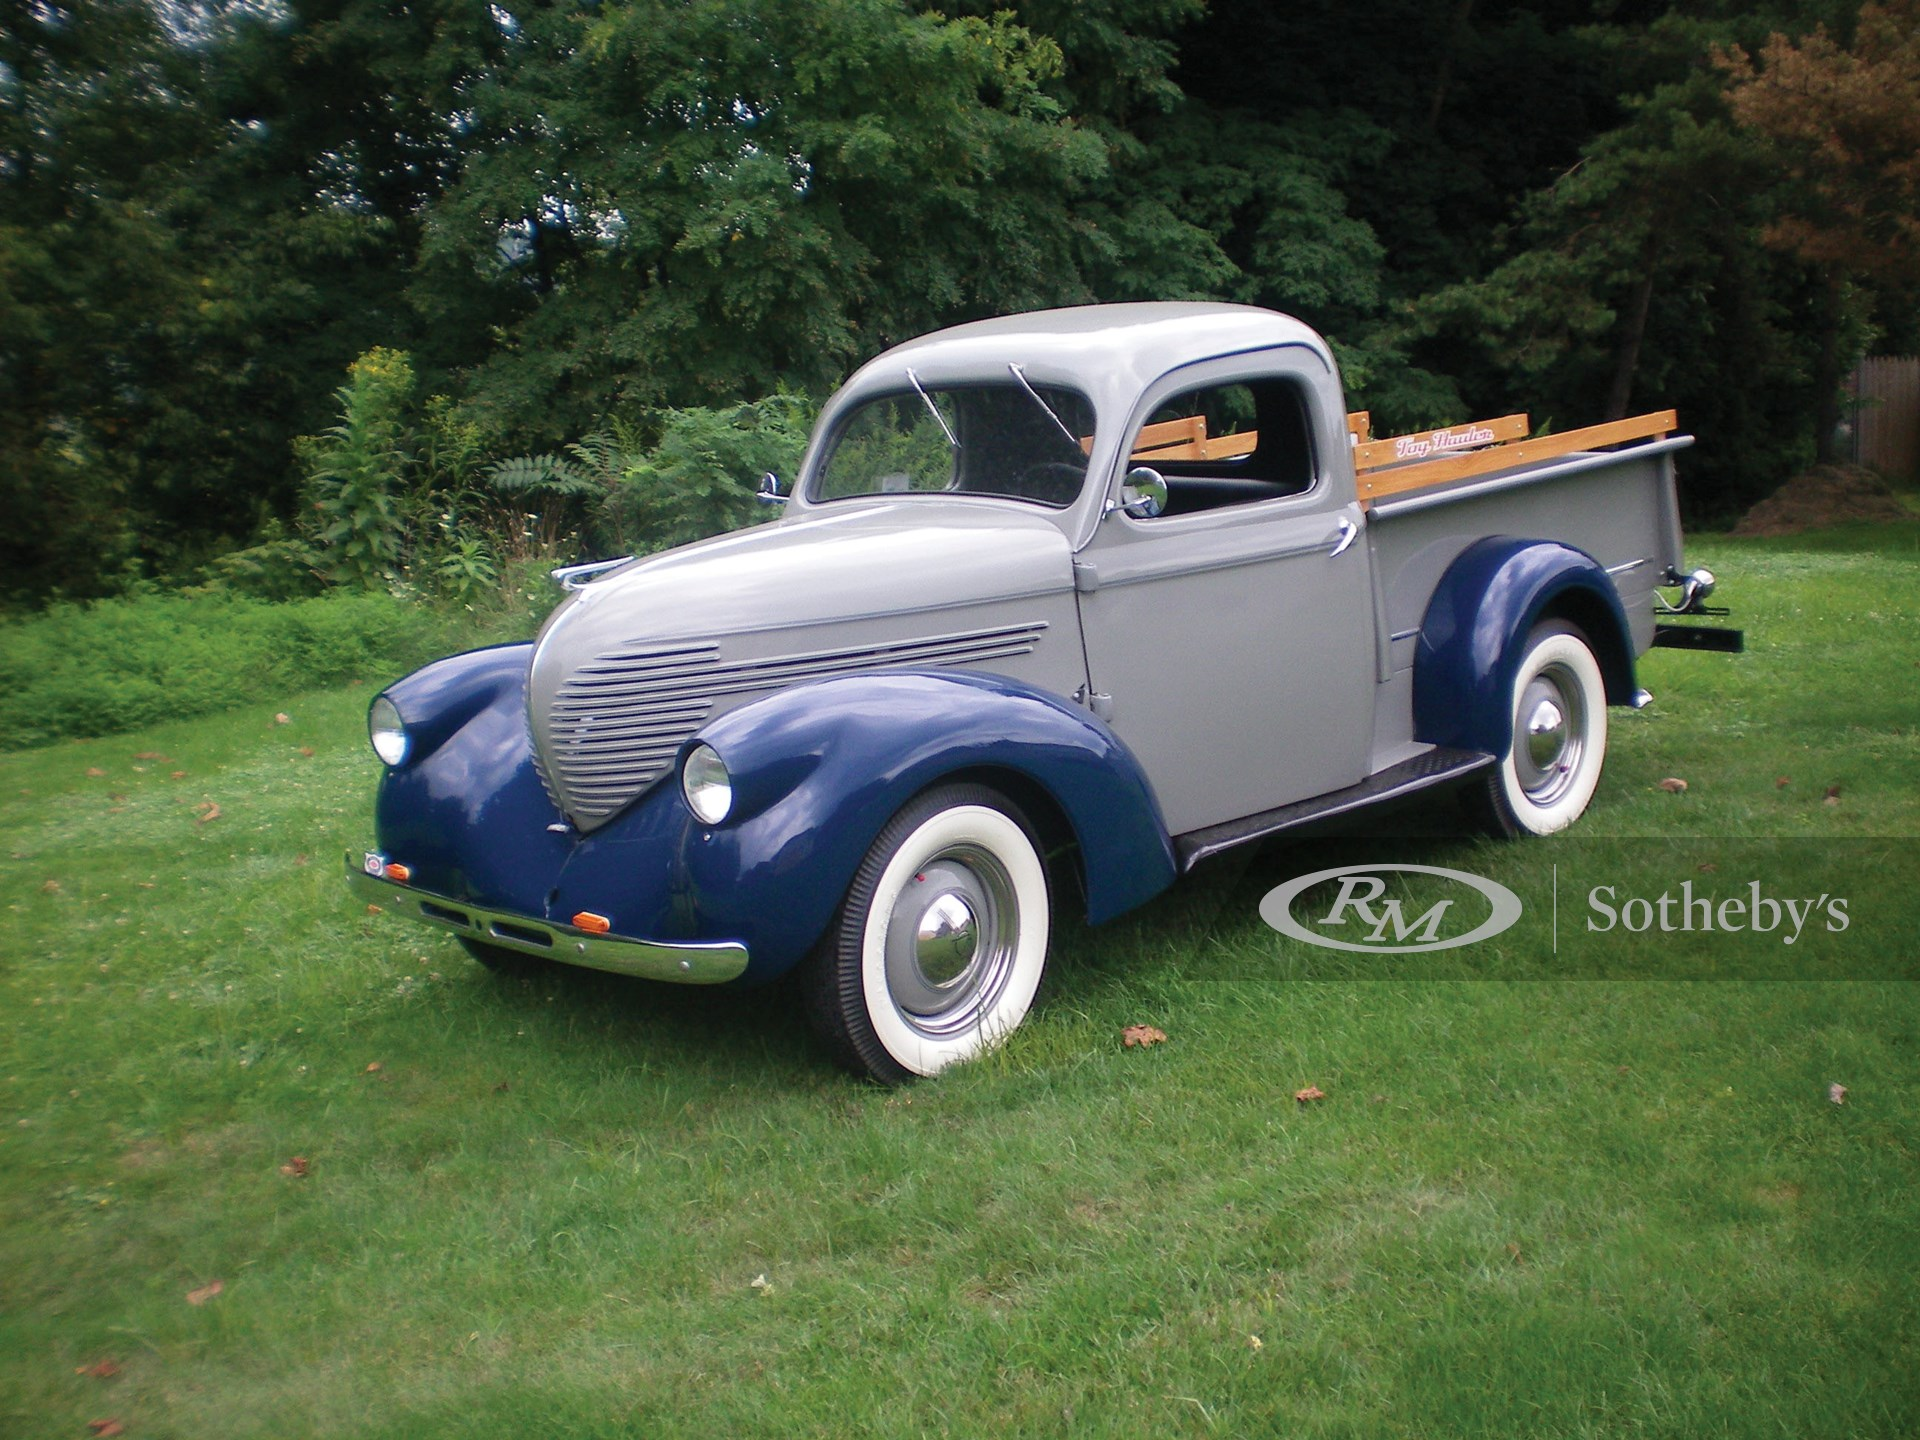 1938 Willys - Overland Model 77